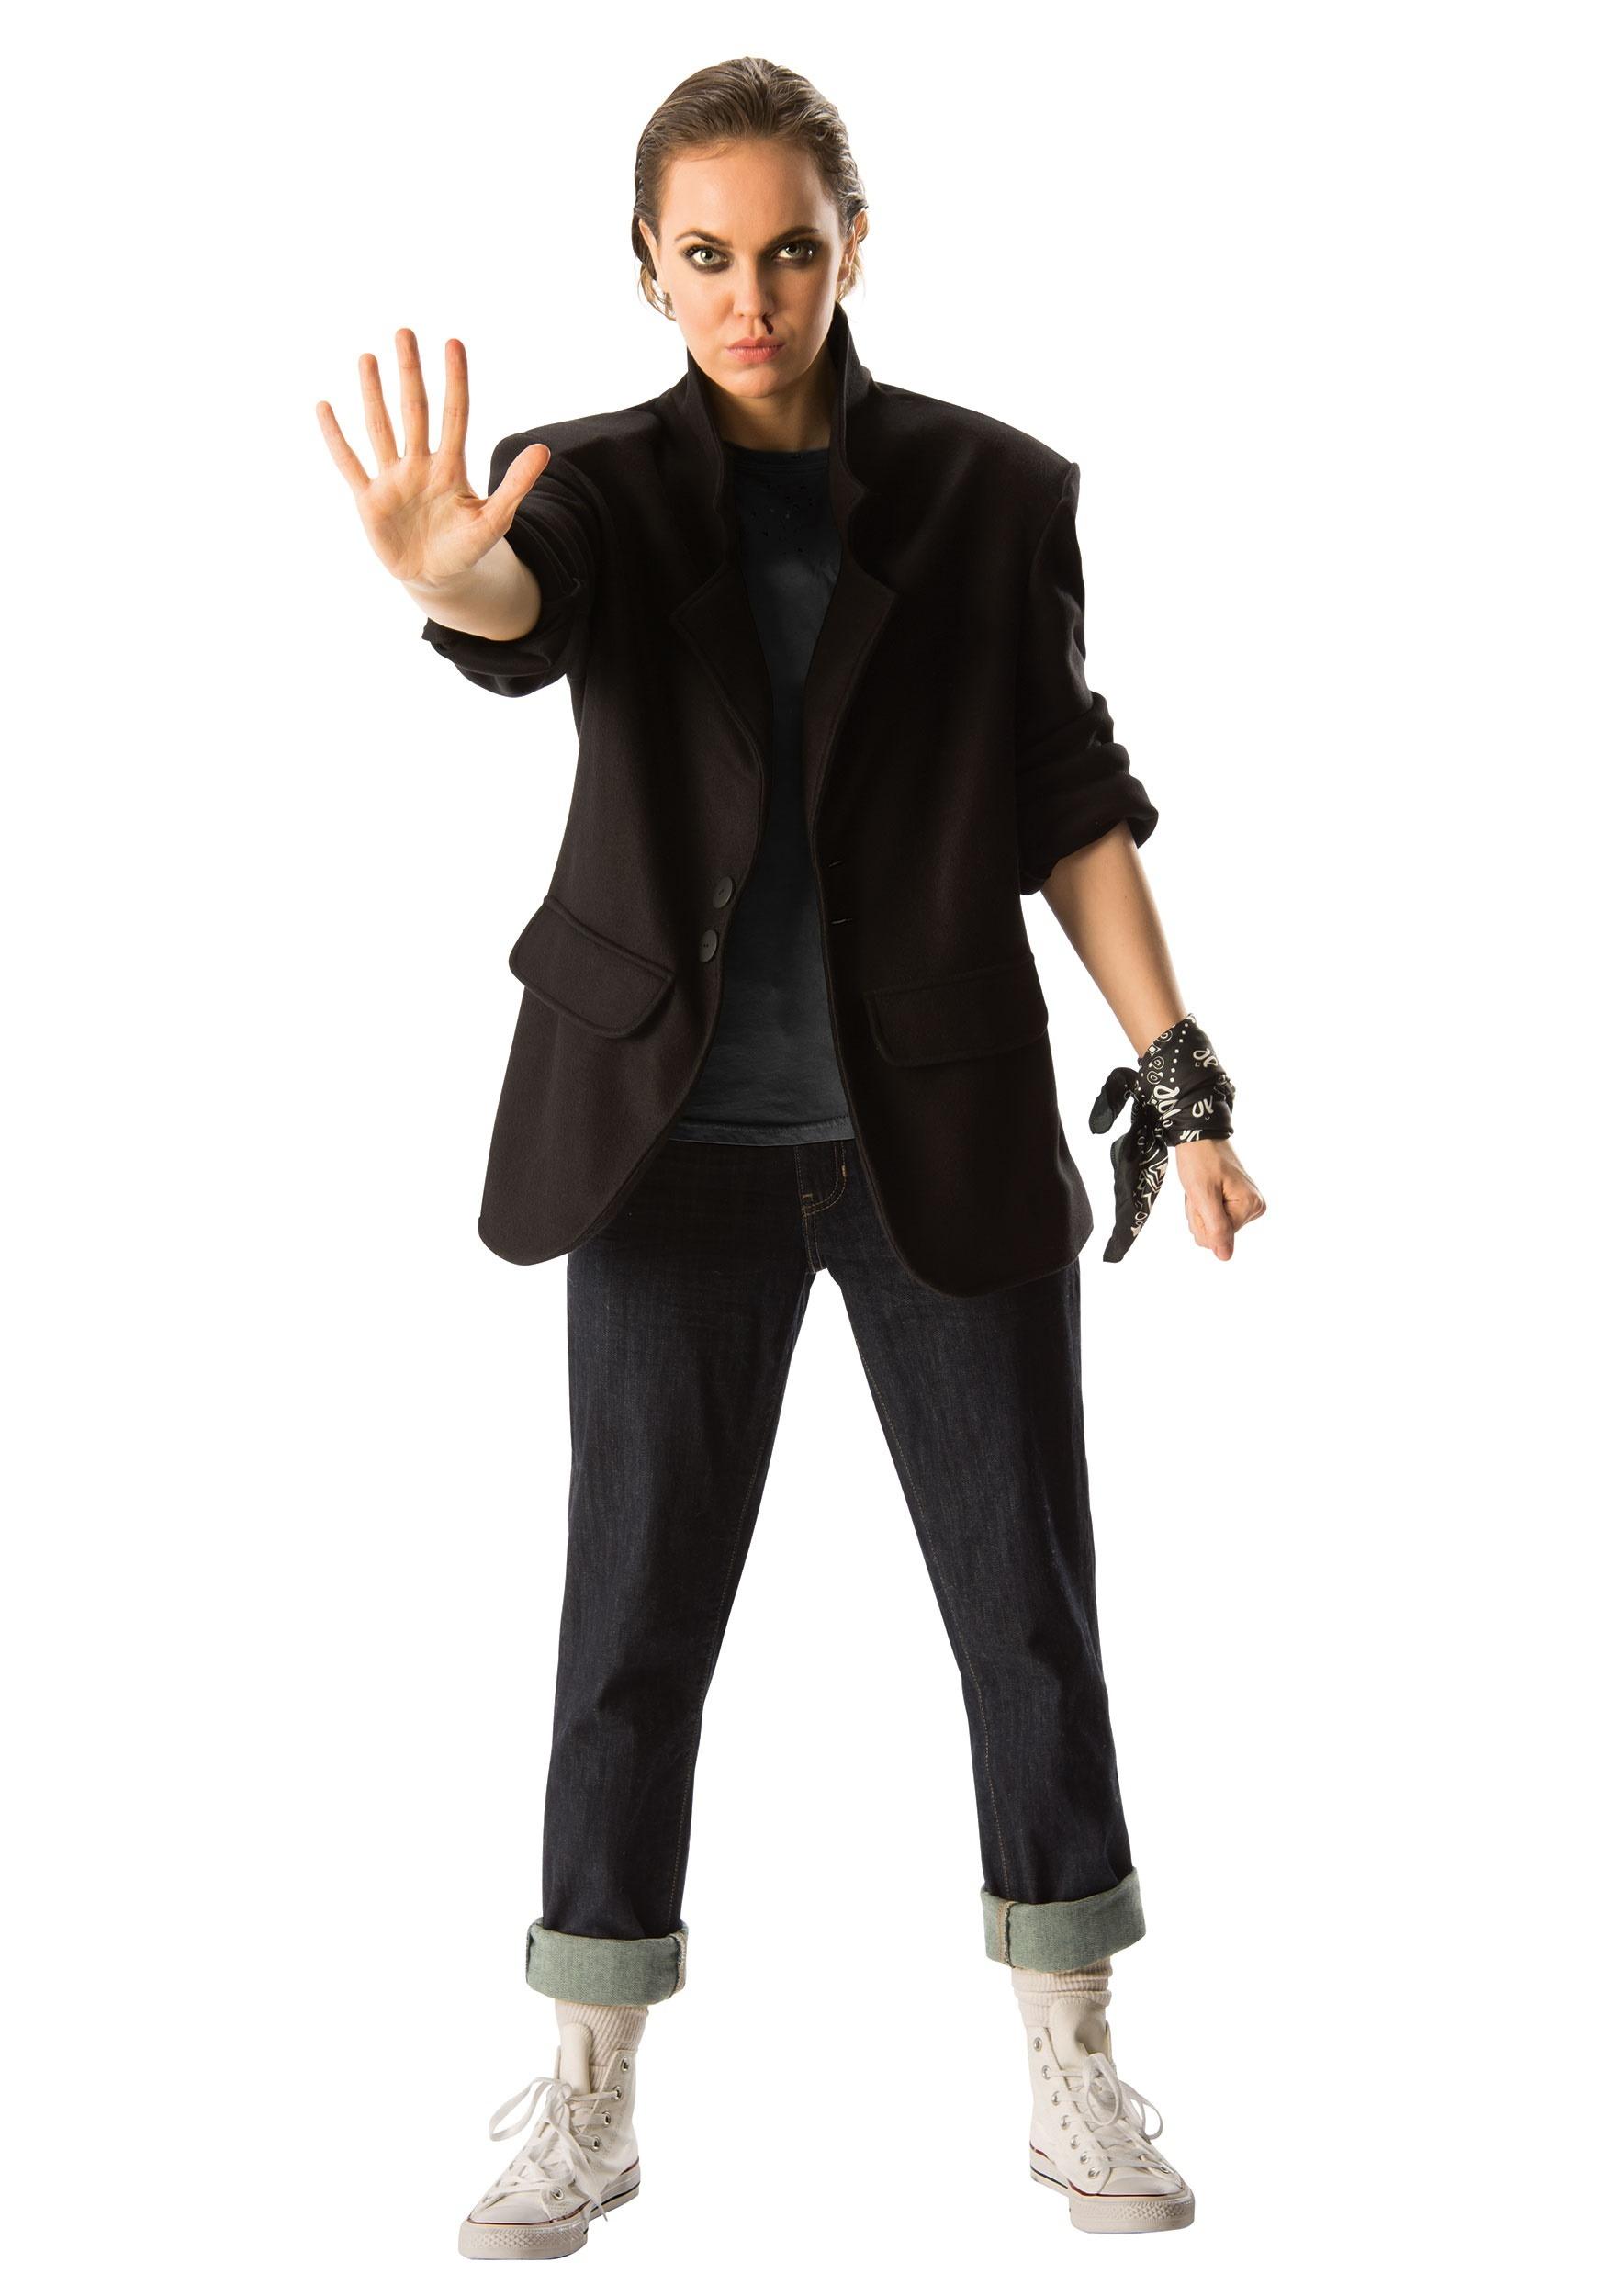 Image result for eleven punk costume